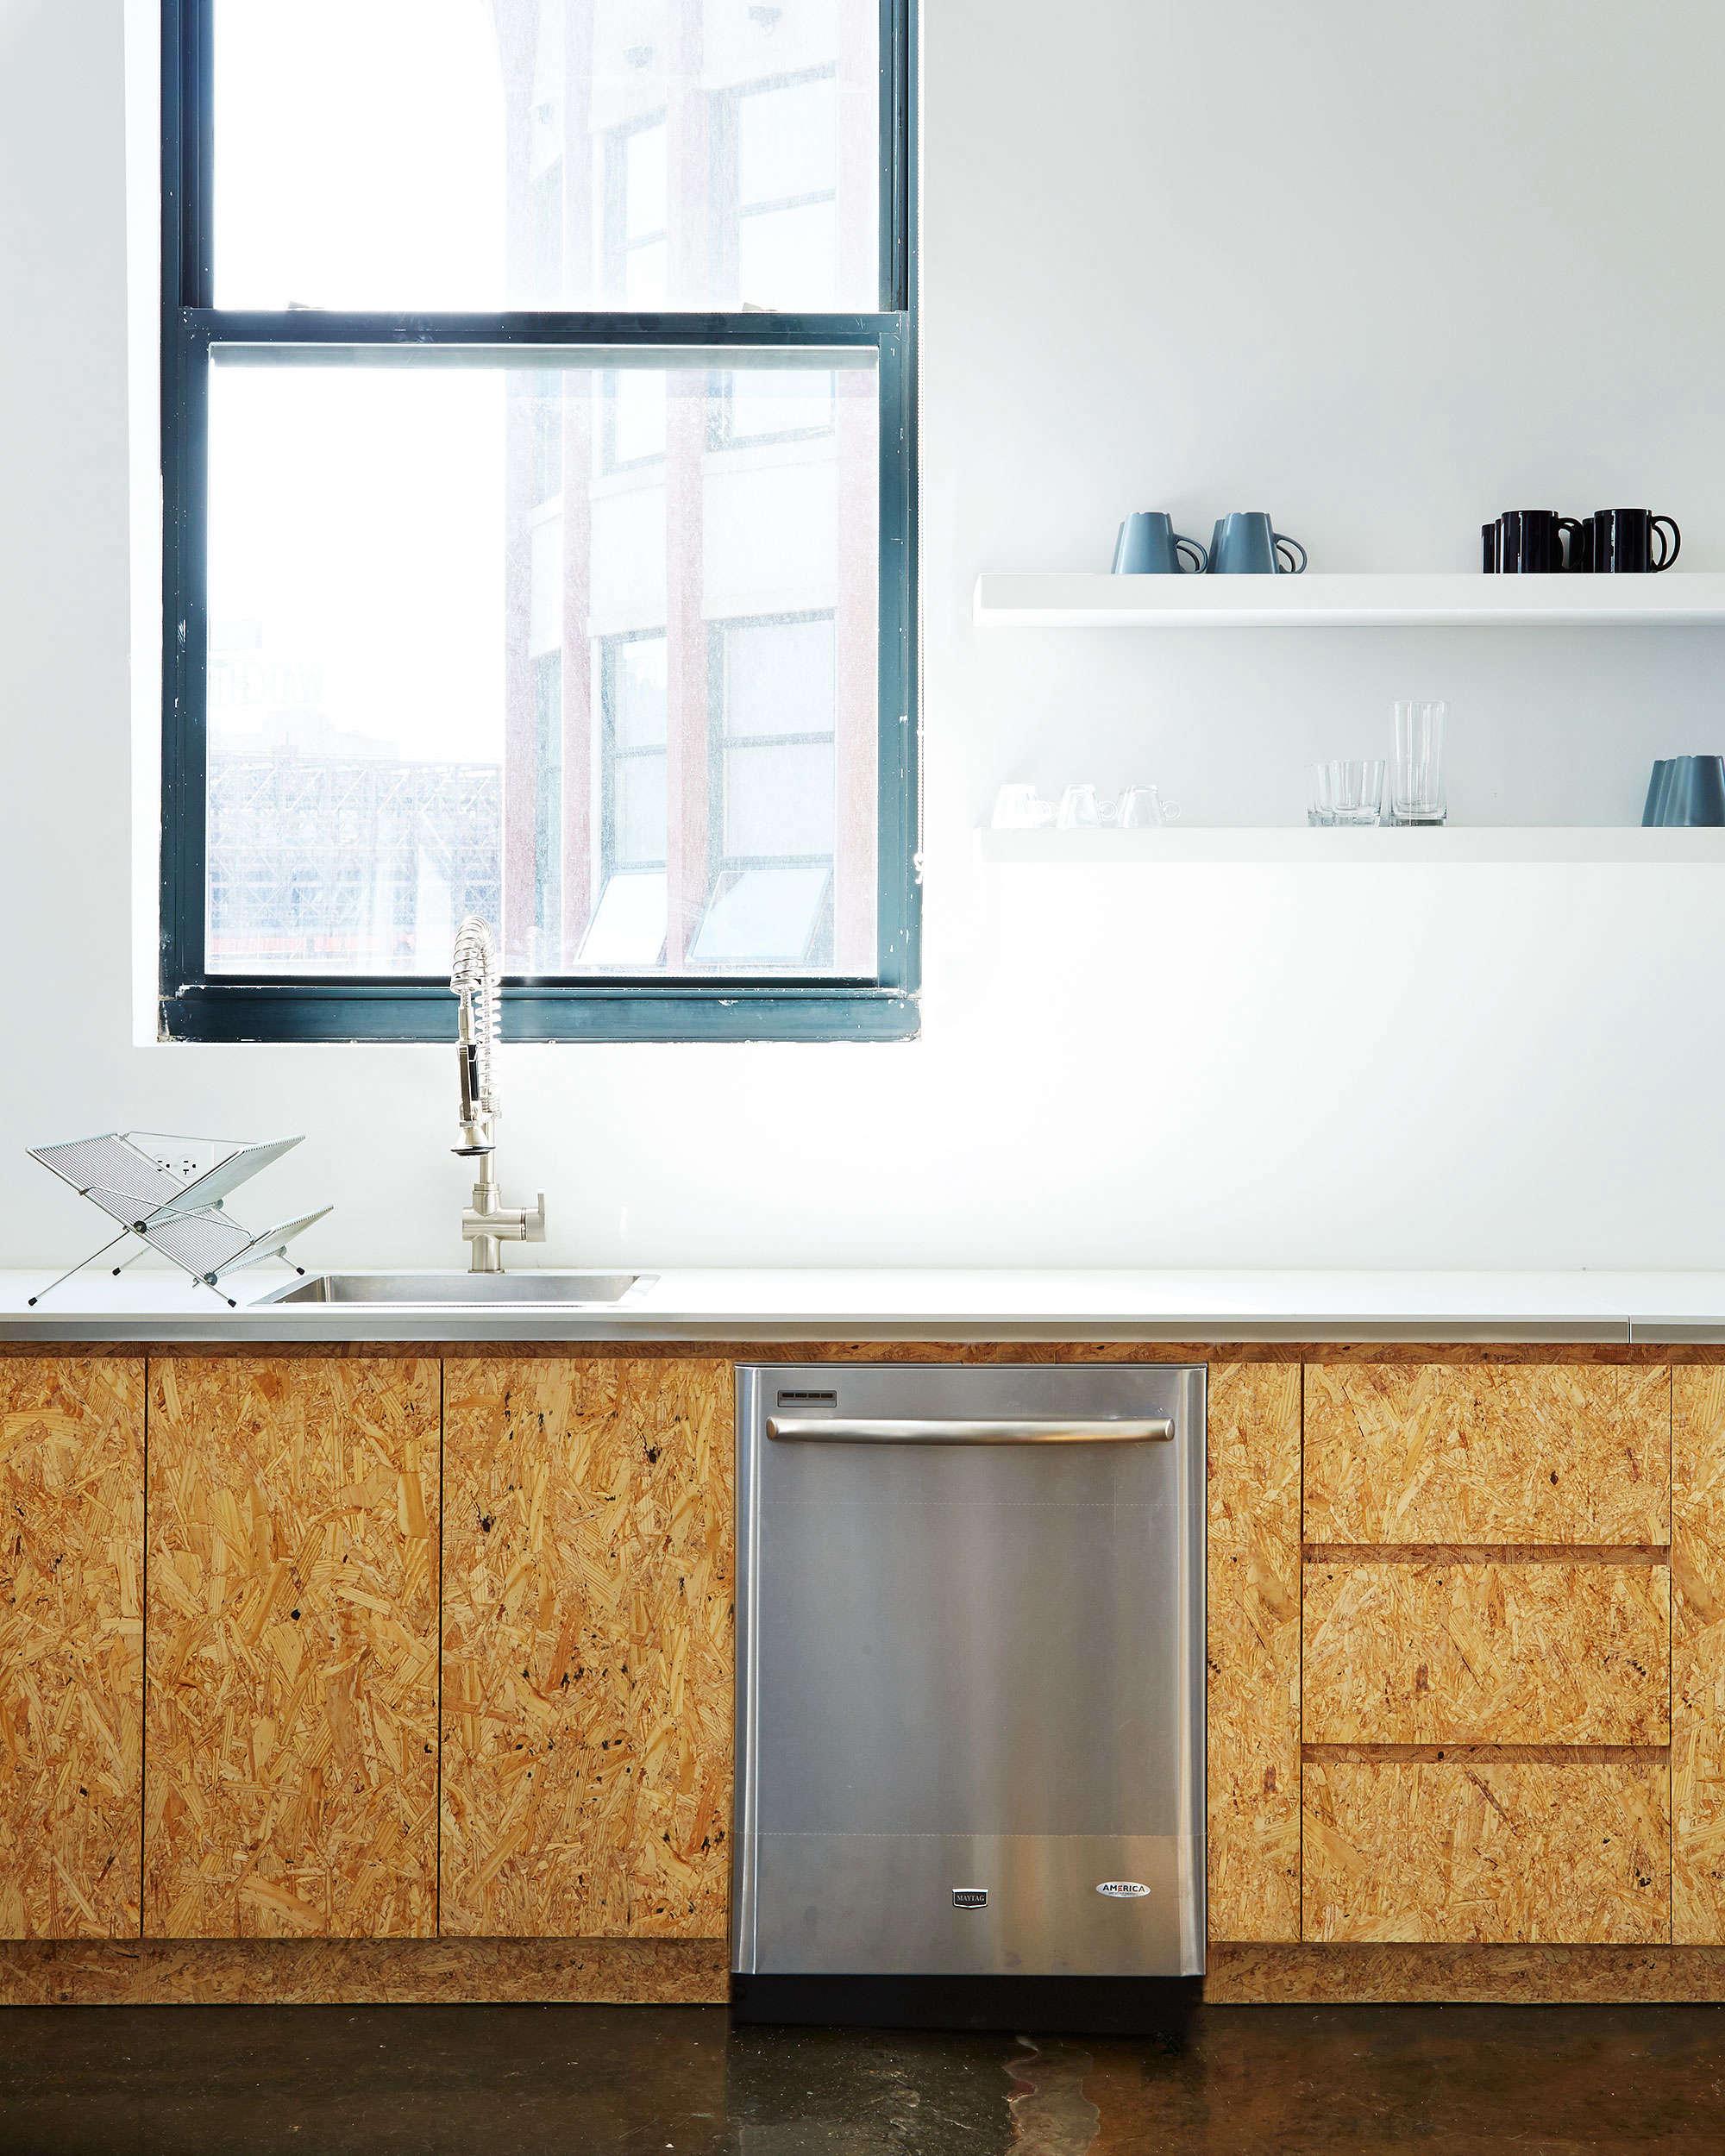 custom chipboard kitchen cabinets in the brad sherman designed office kitchen f 10